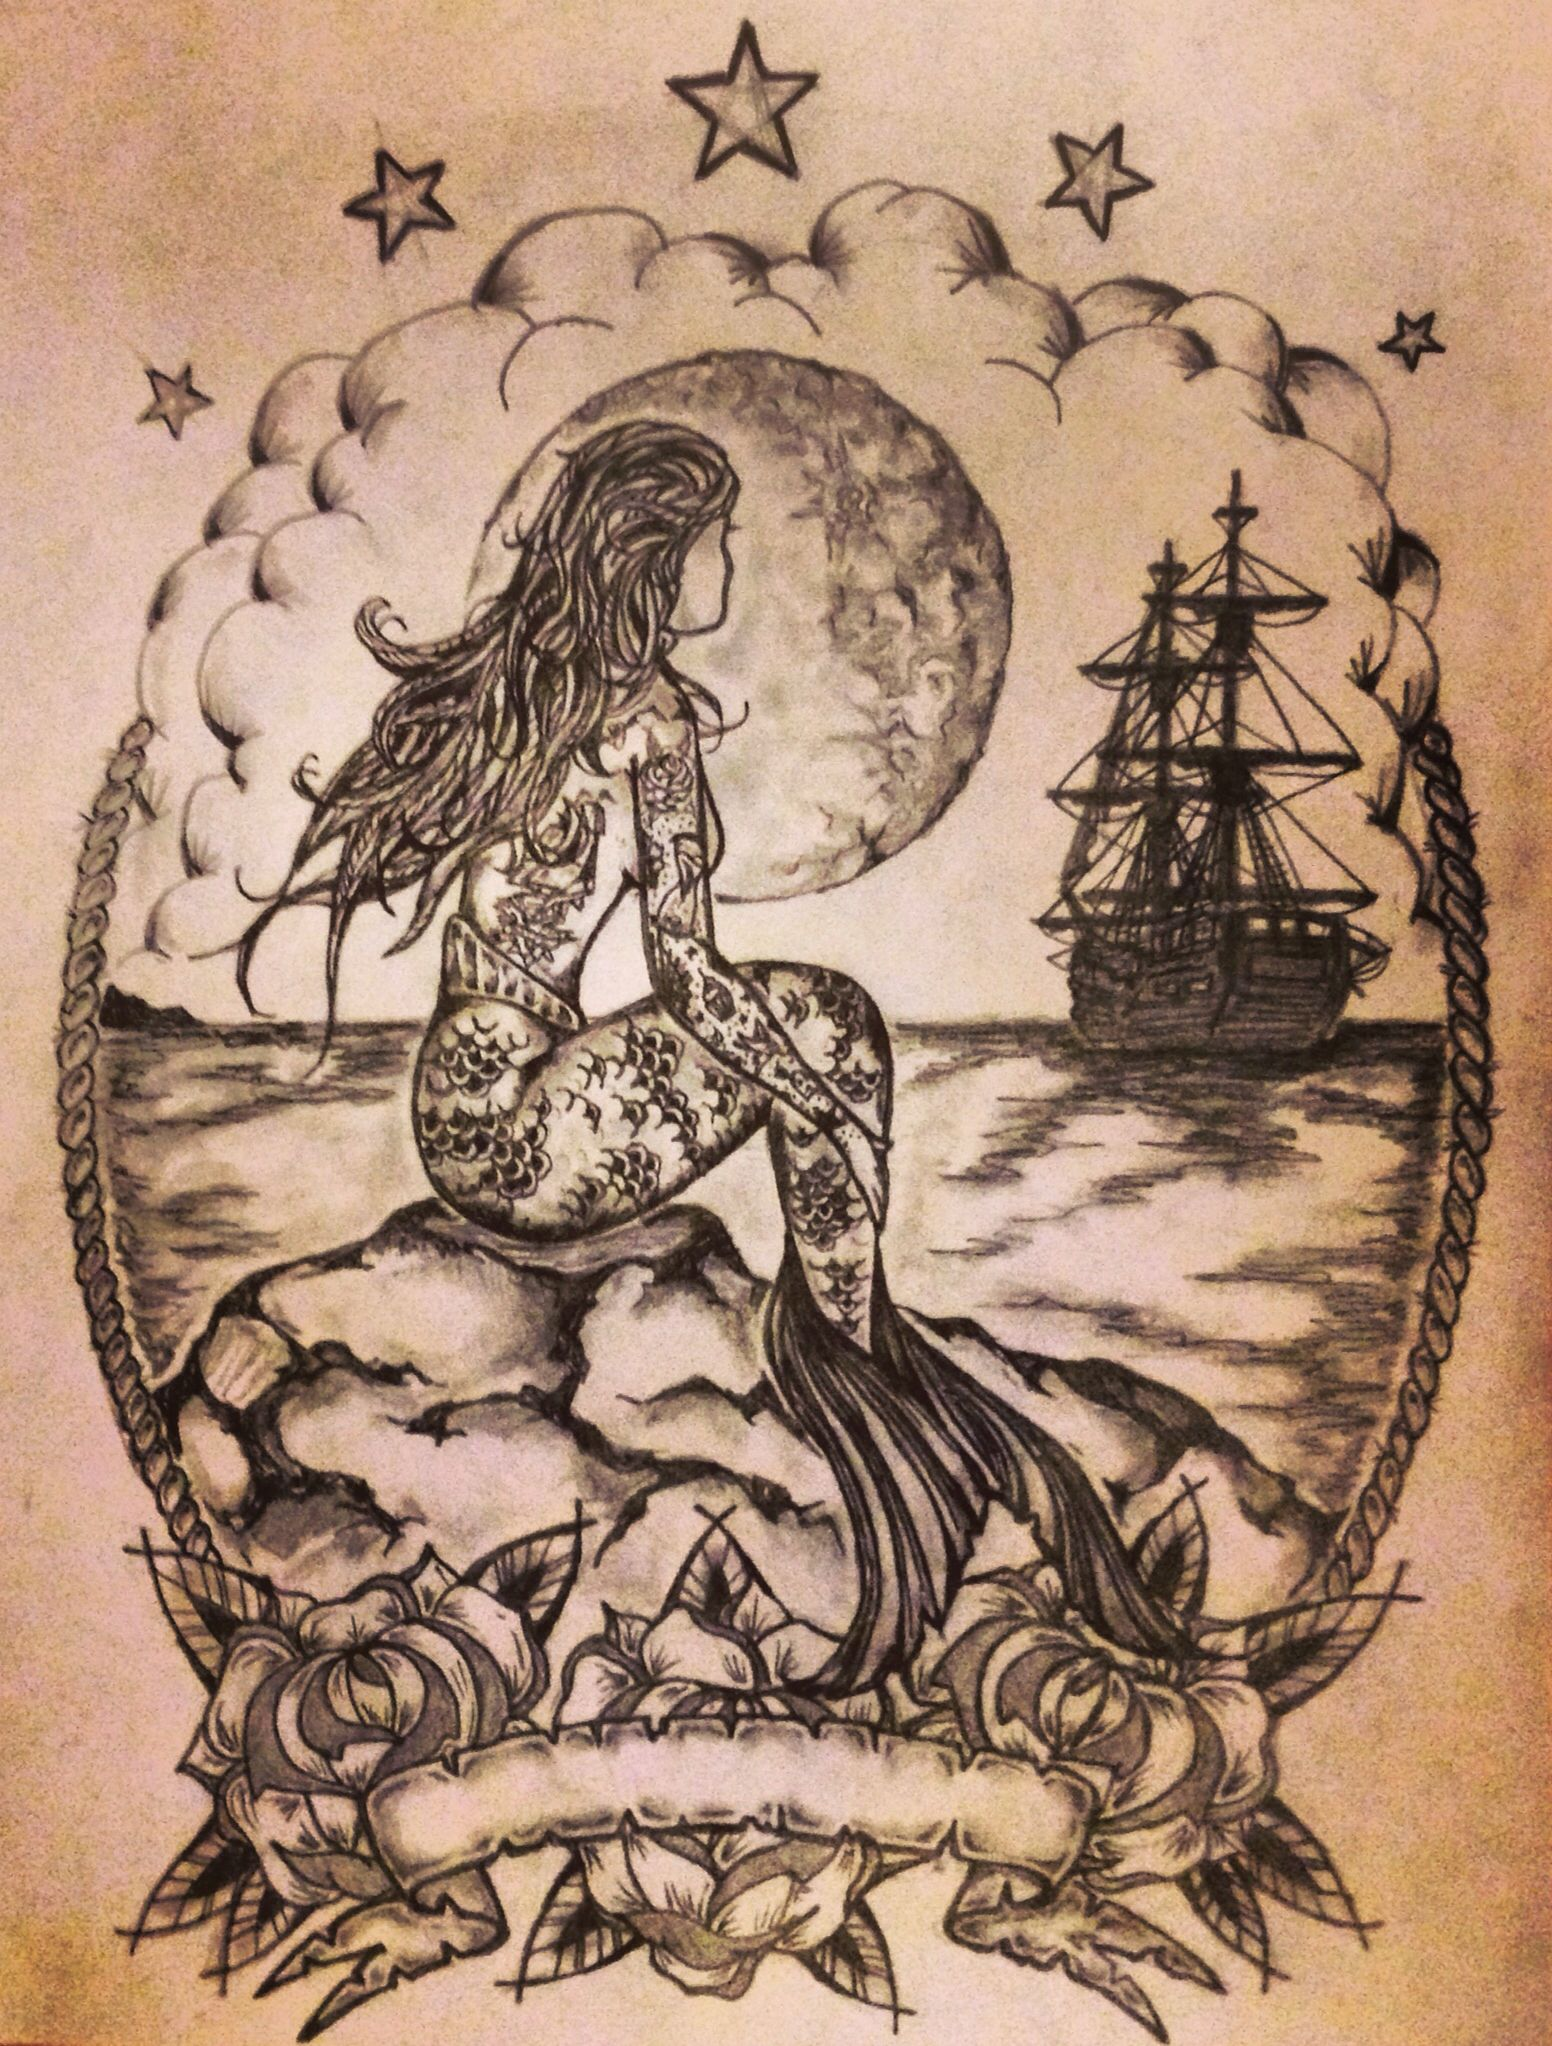 Mermaid Ship Tattoo Sketch By